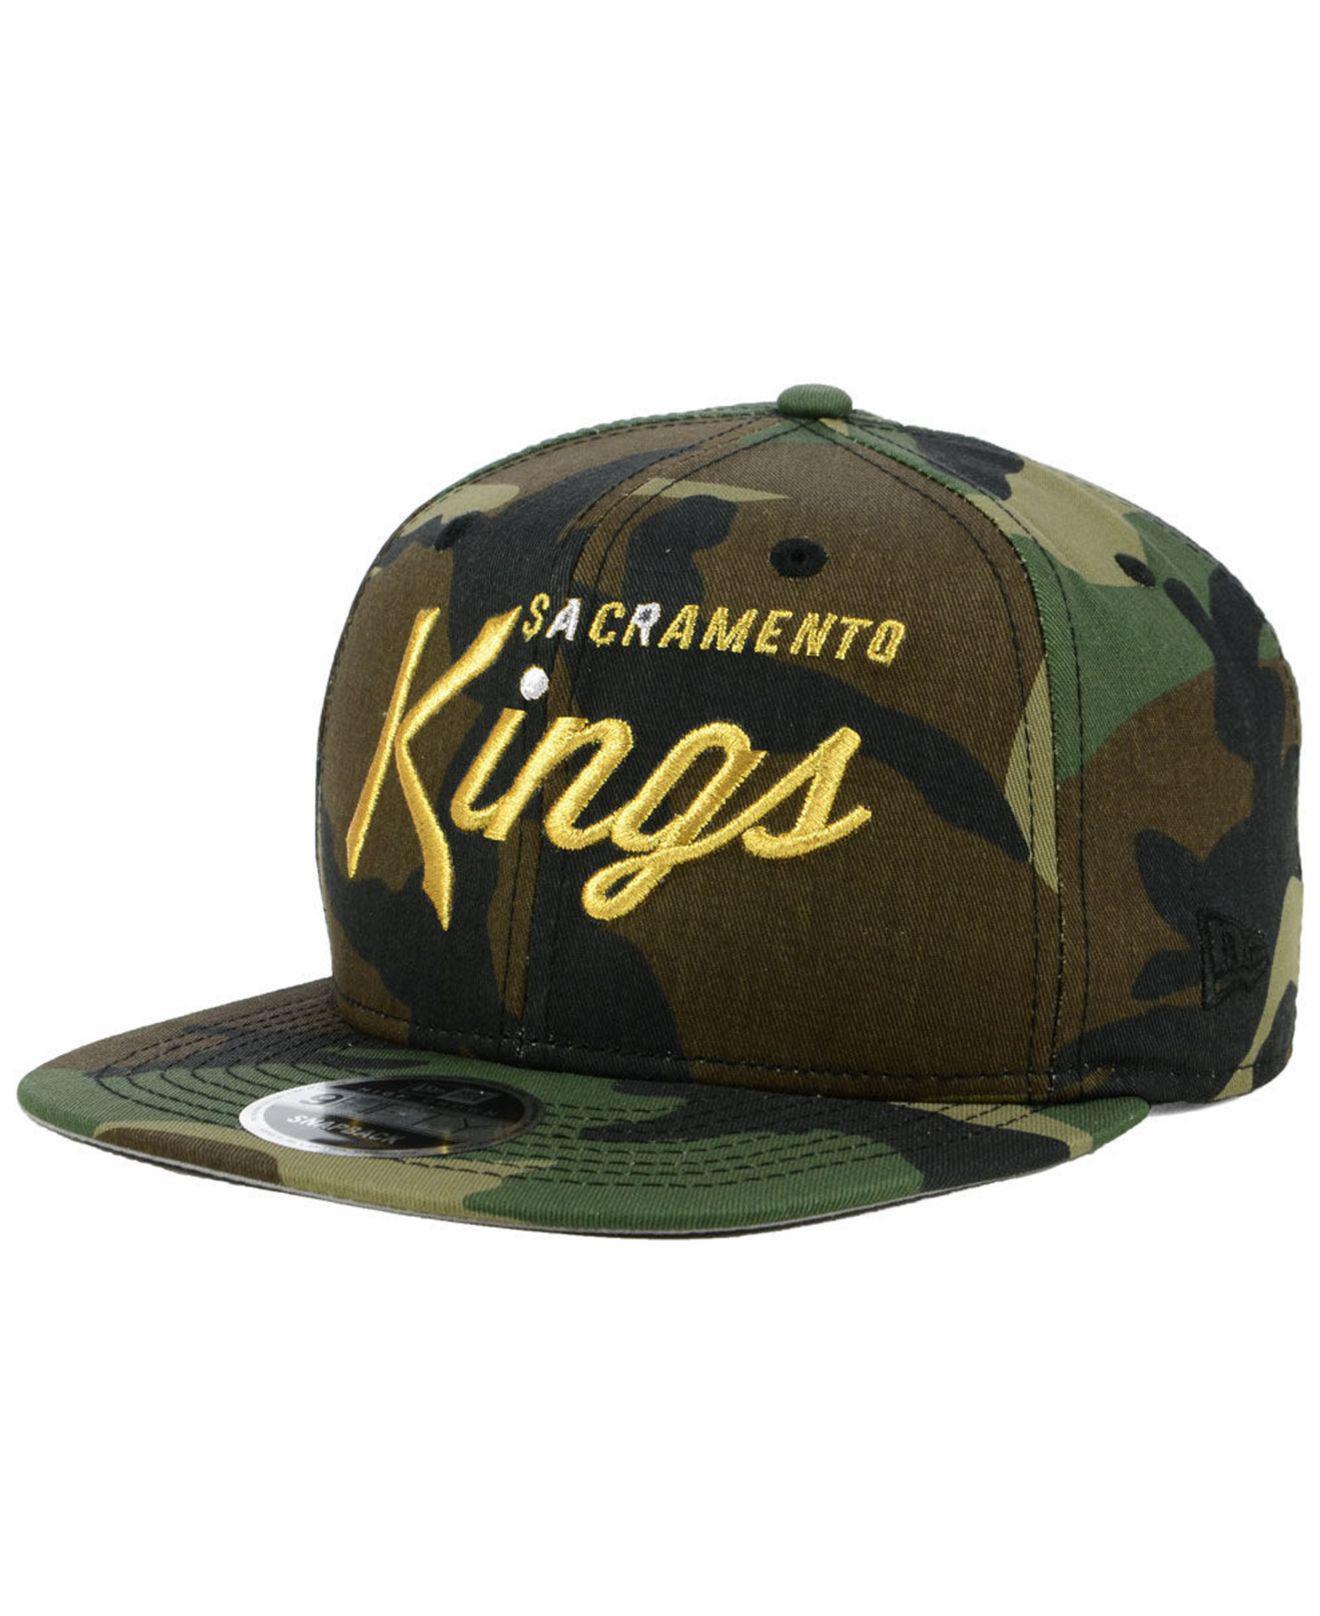 lowest price 1ce86 d20e9 ... Sacramento Kings Classic Script 9fifty Snapback Cap for Men - Lyst.  View fullscreen